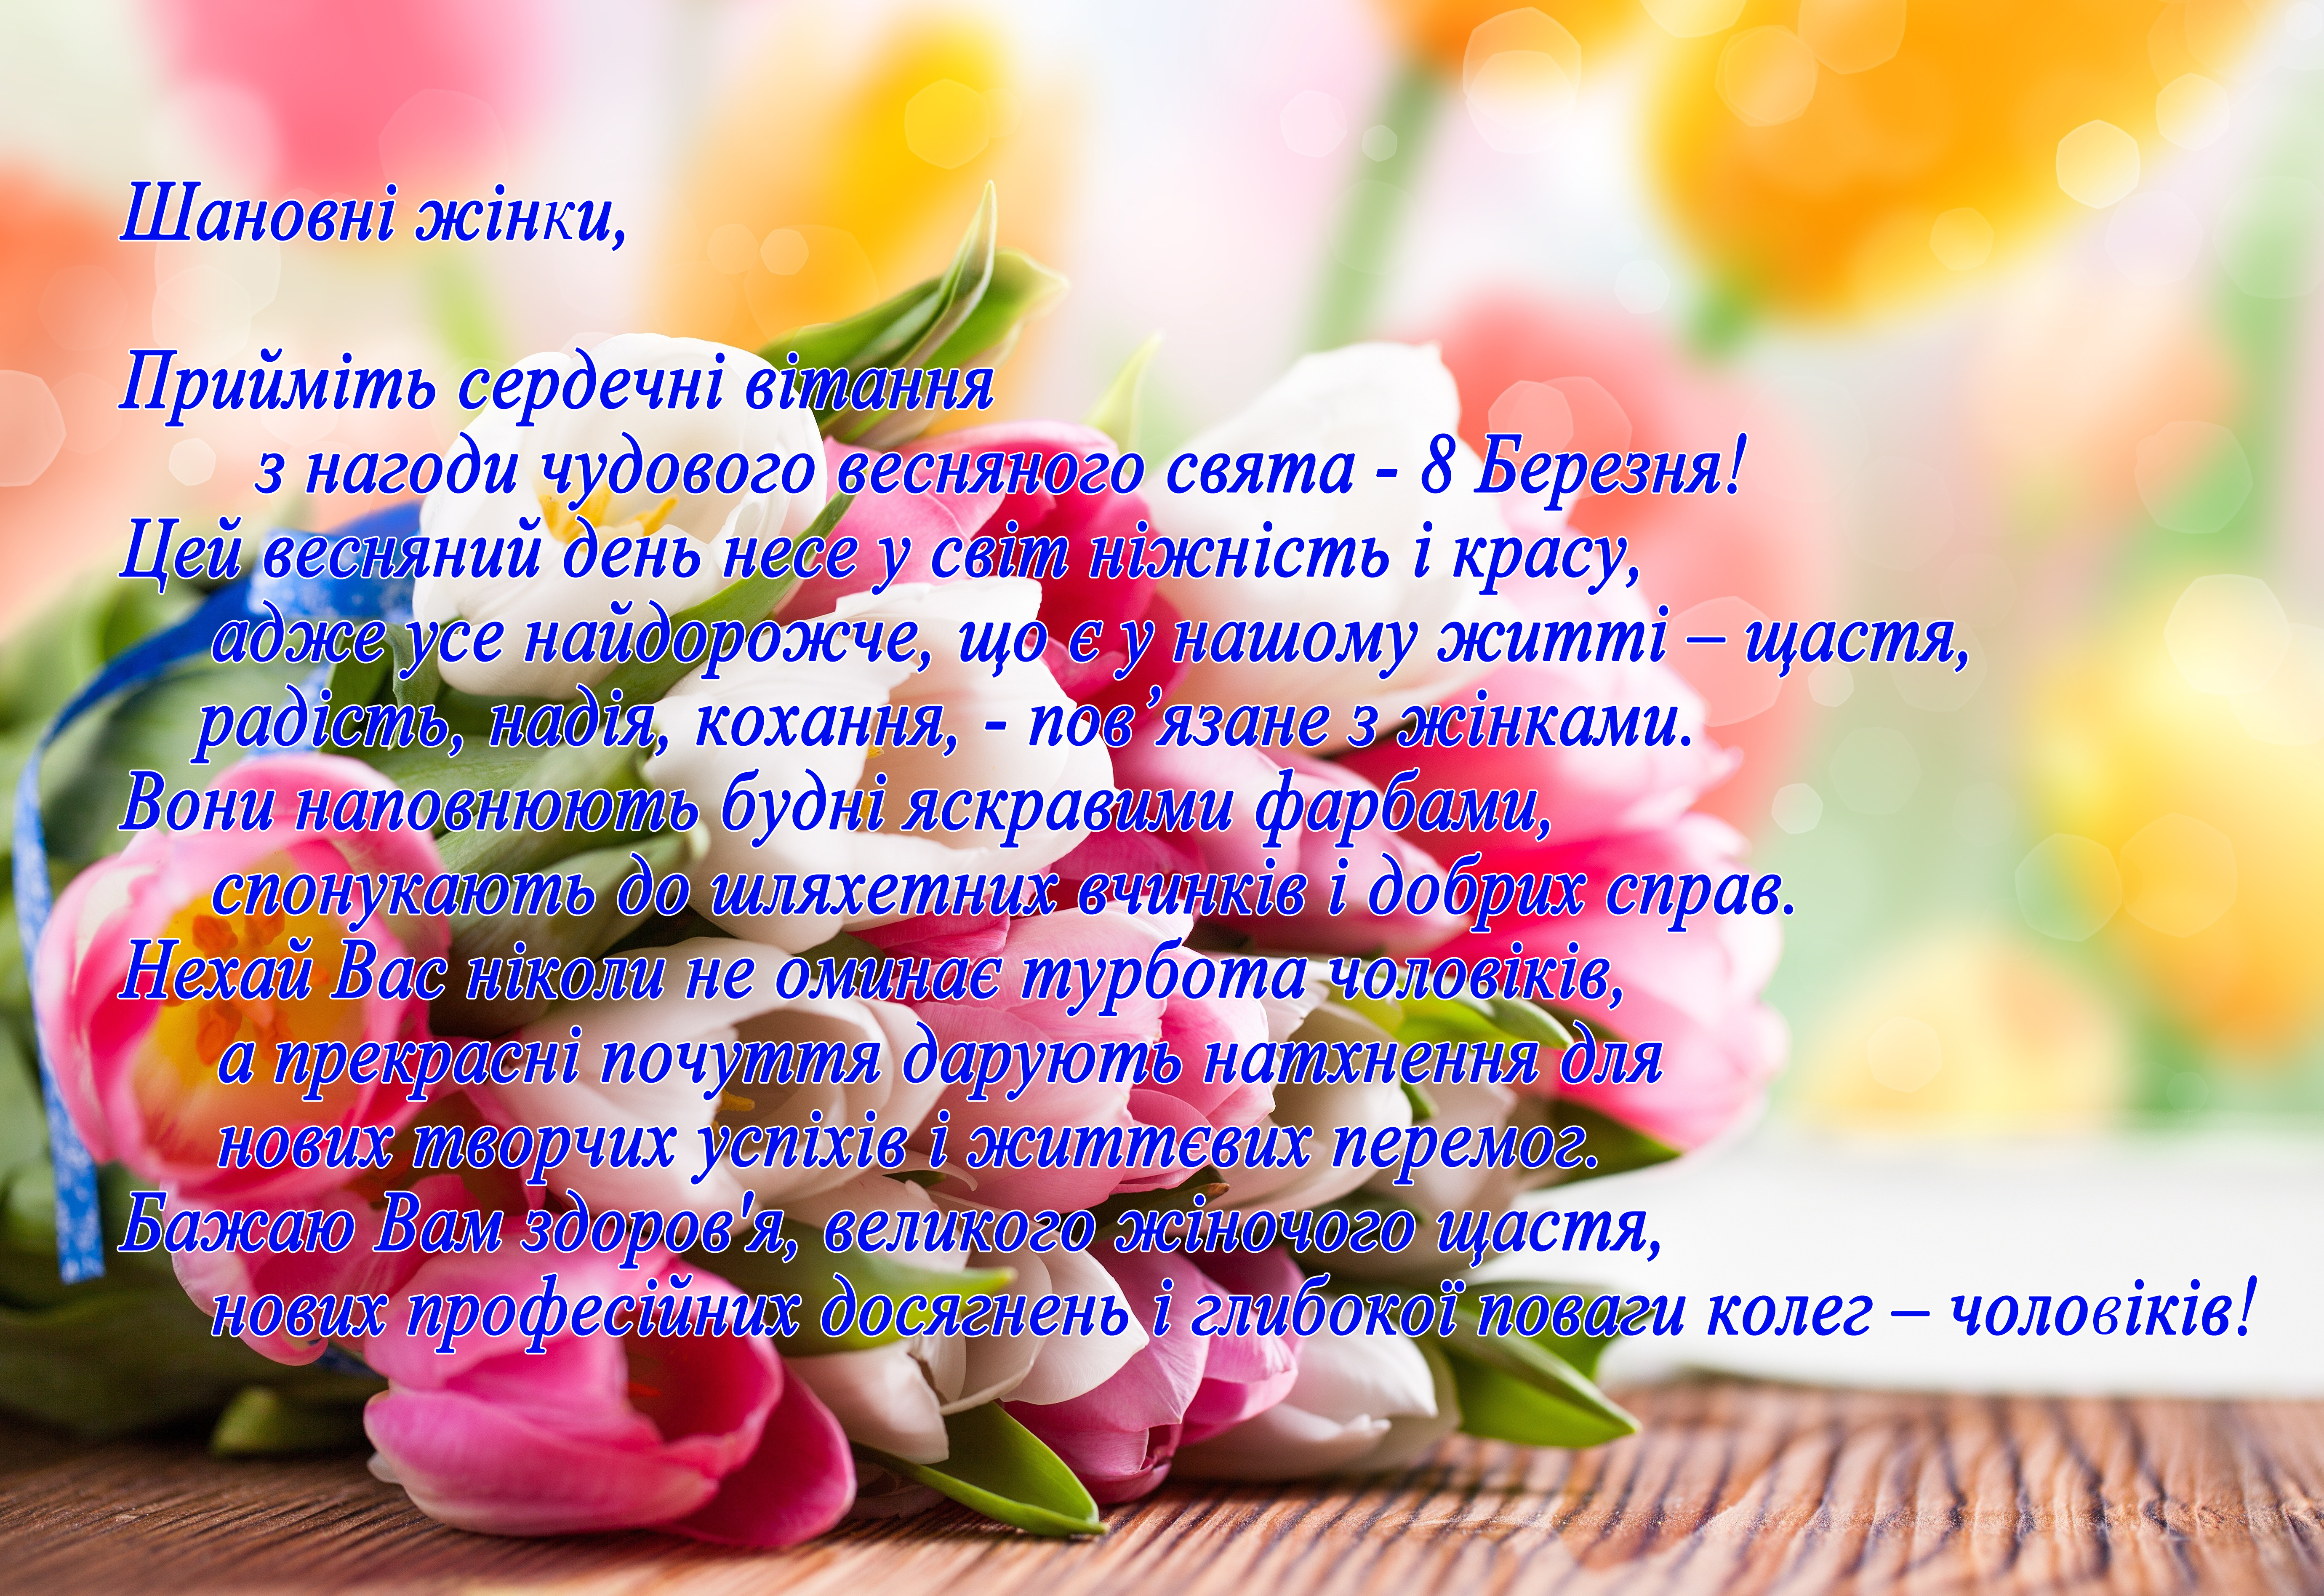 dsc_5166.jpg